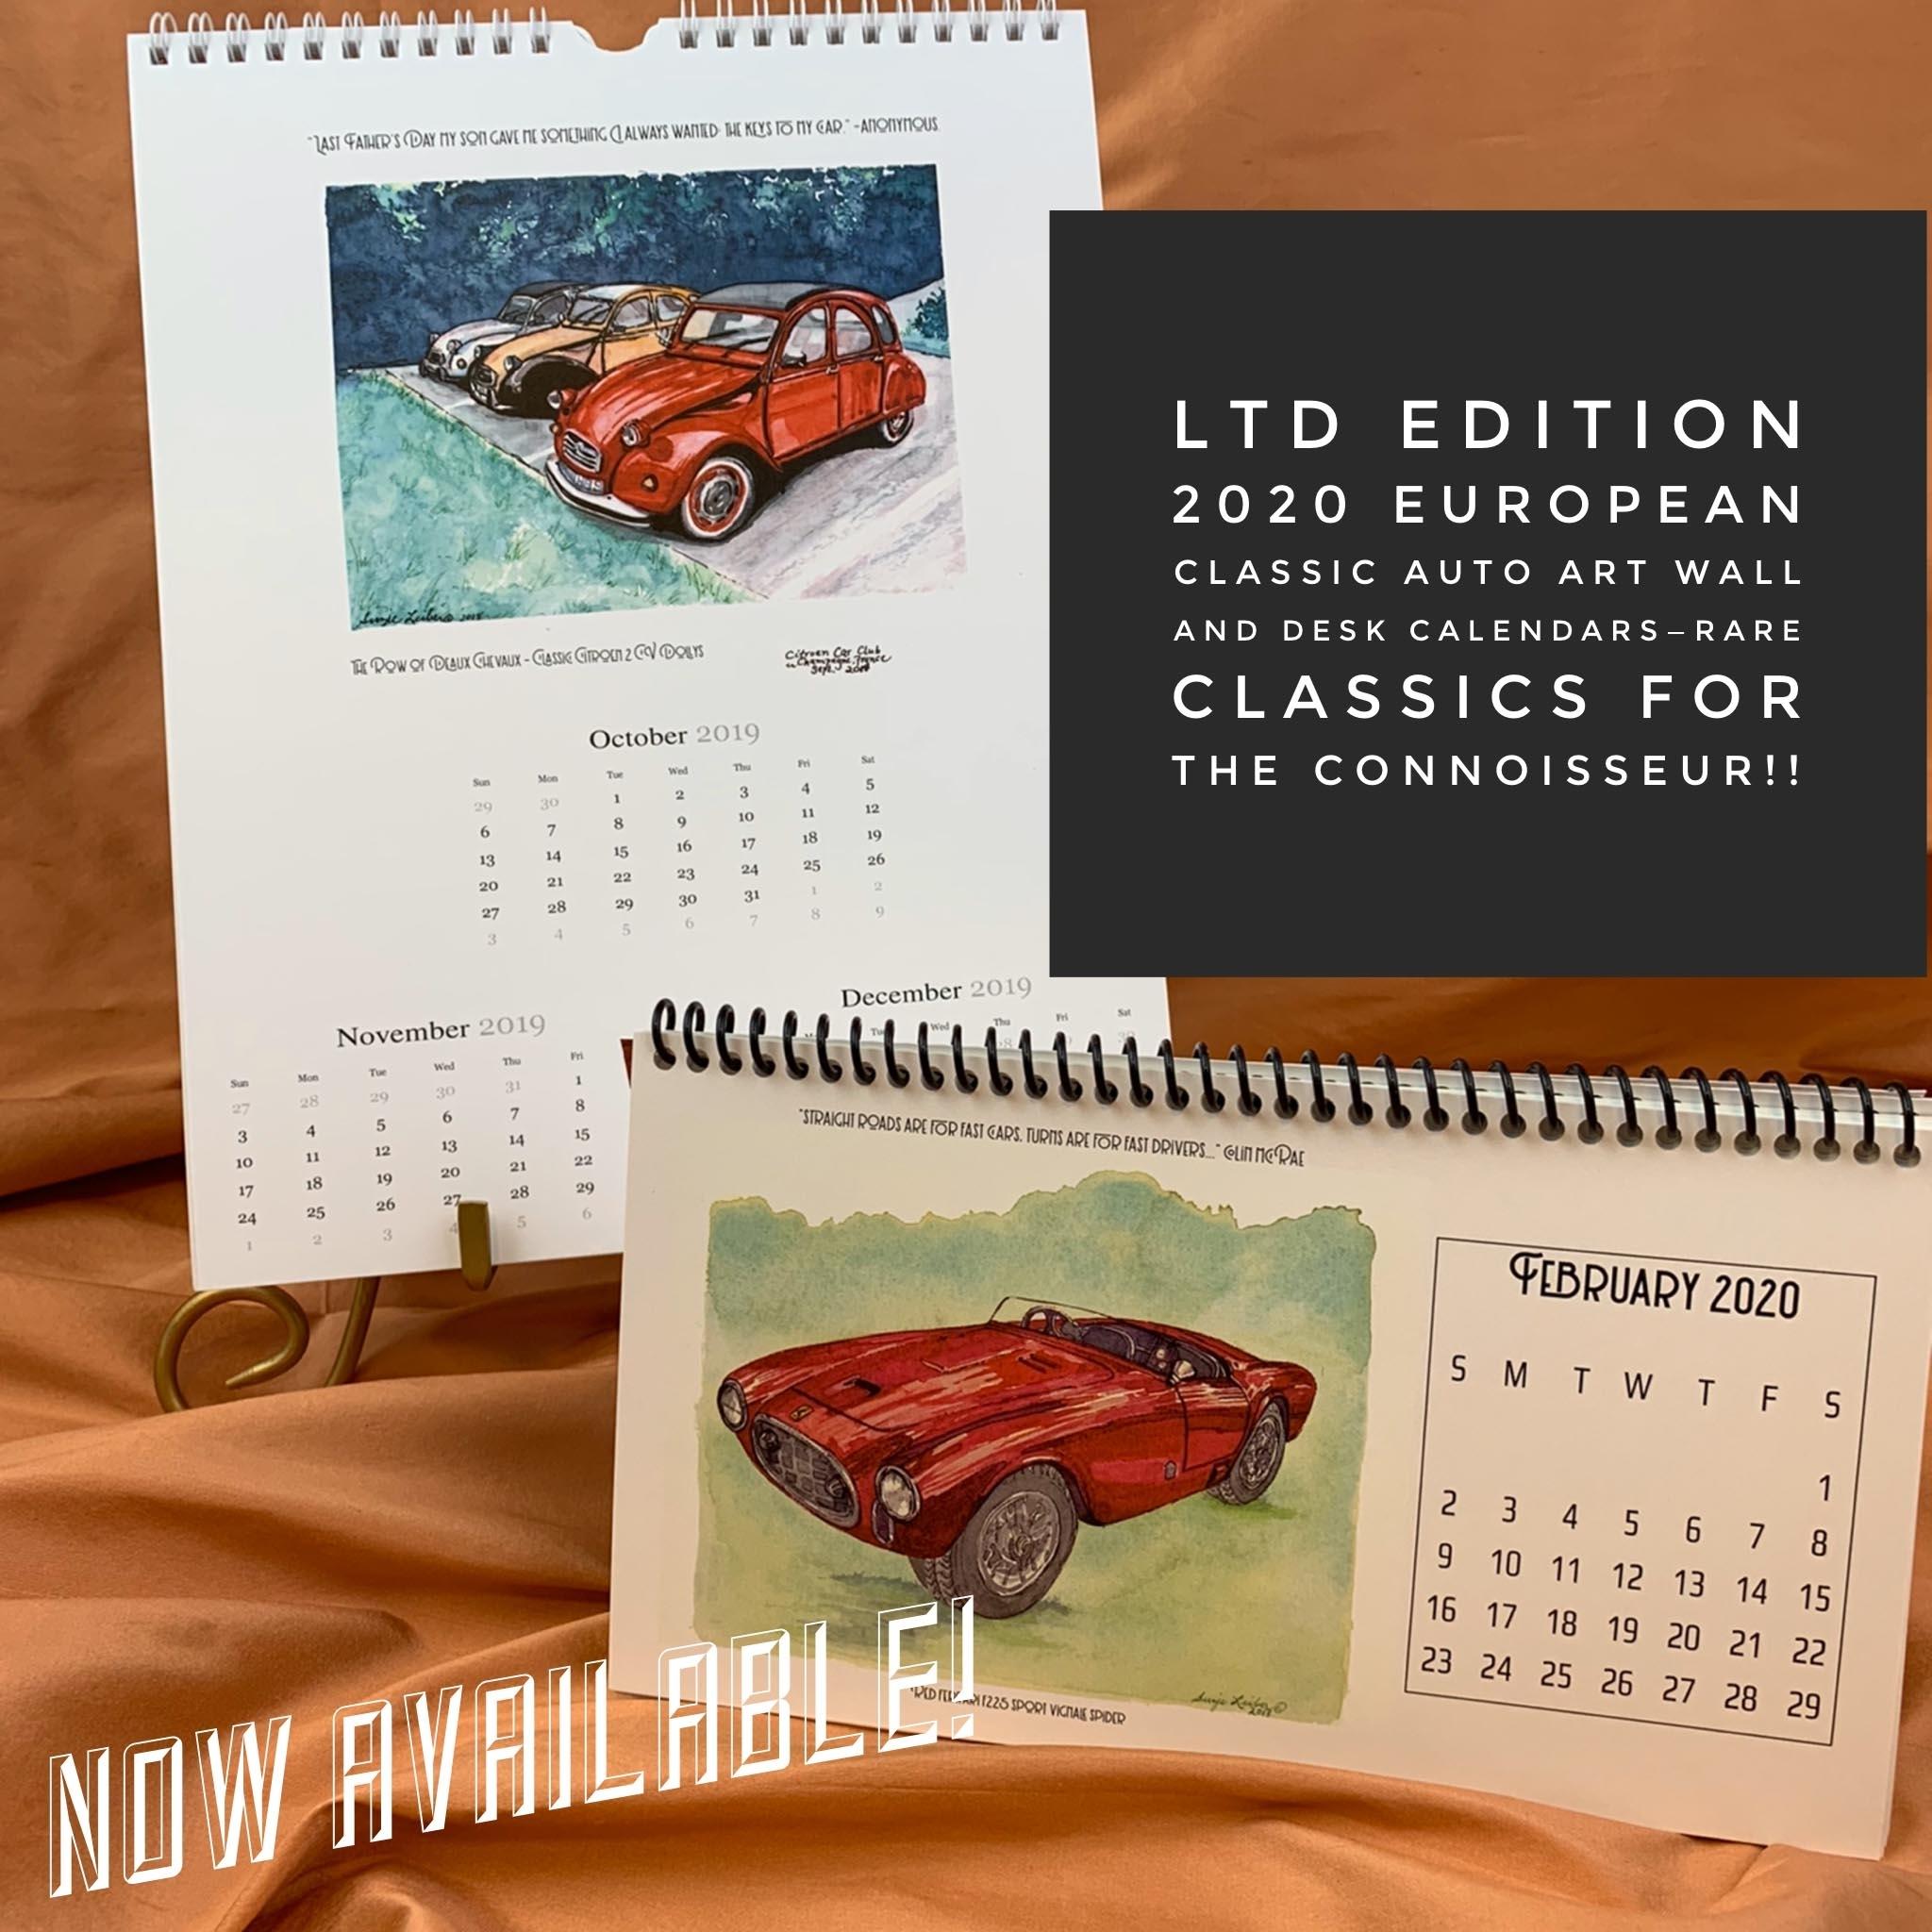 European Classic Cars 2020 Desk Calendar